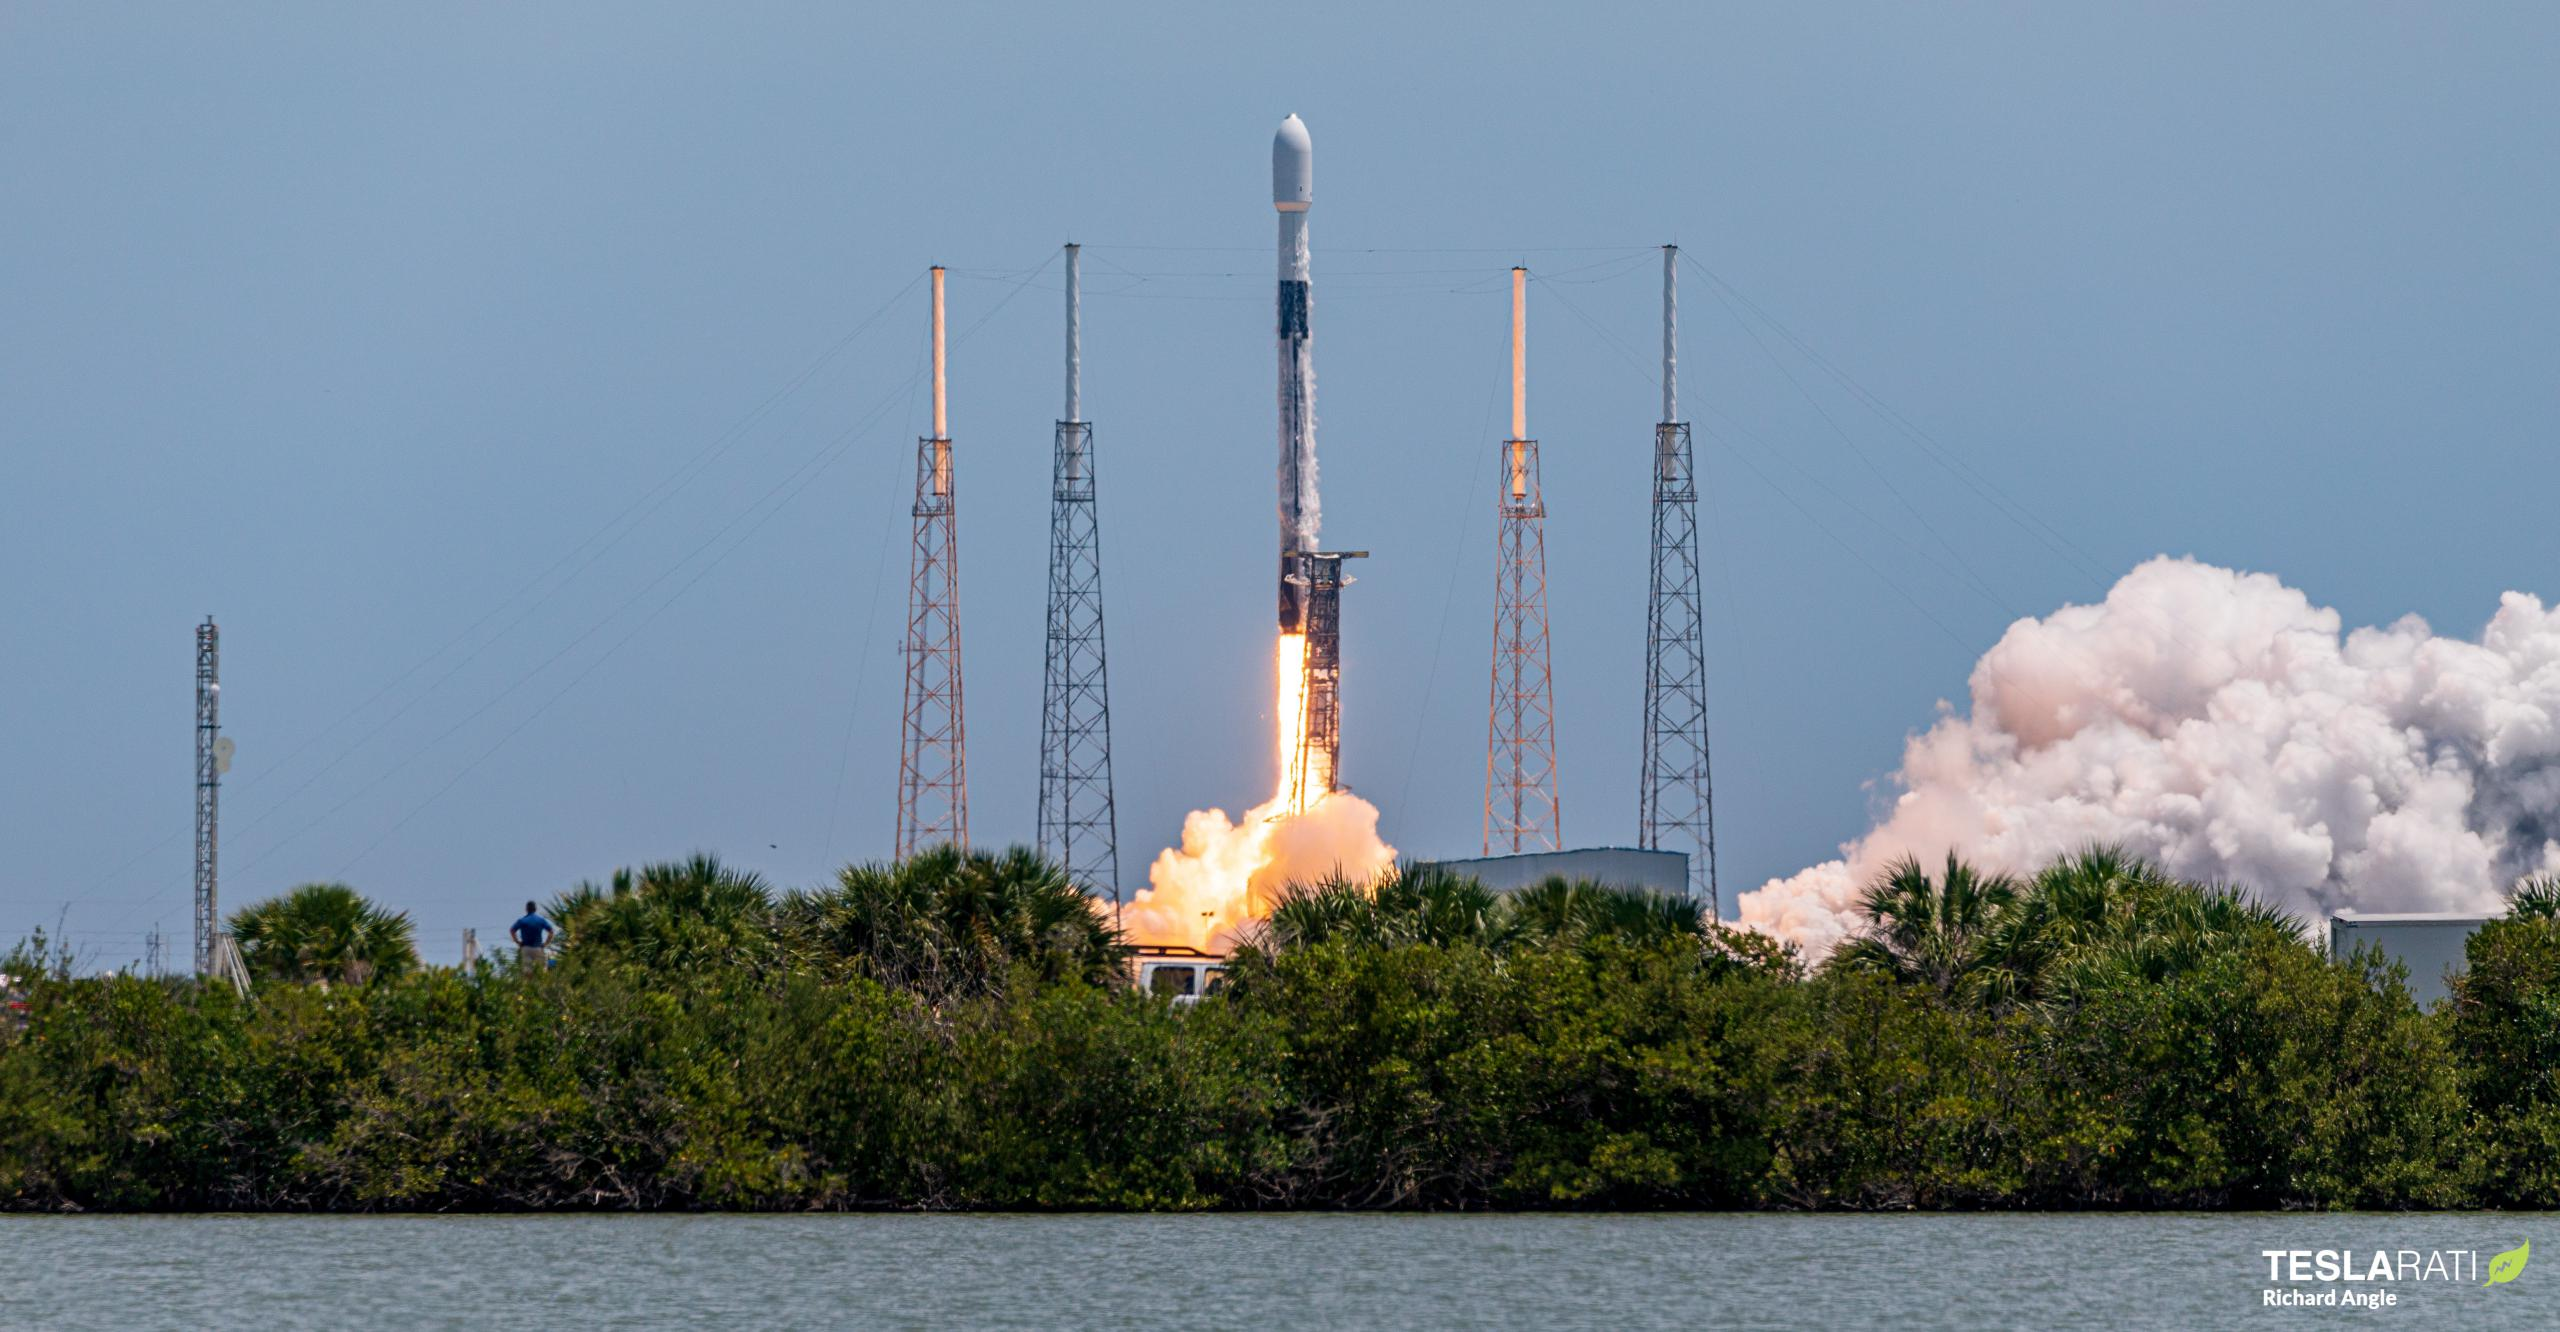 GPS III SV05 Falcon 9 B1062 LC40 061721 (Richard Angle) launch 3 crop (c)